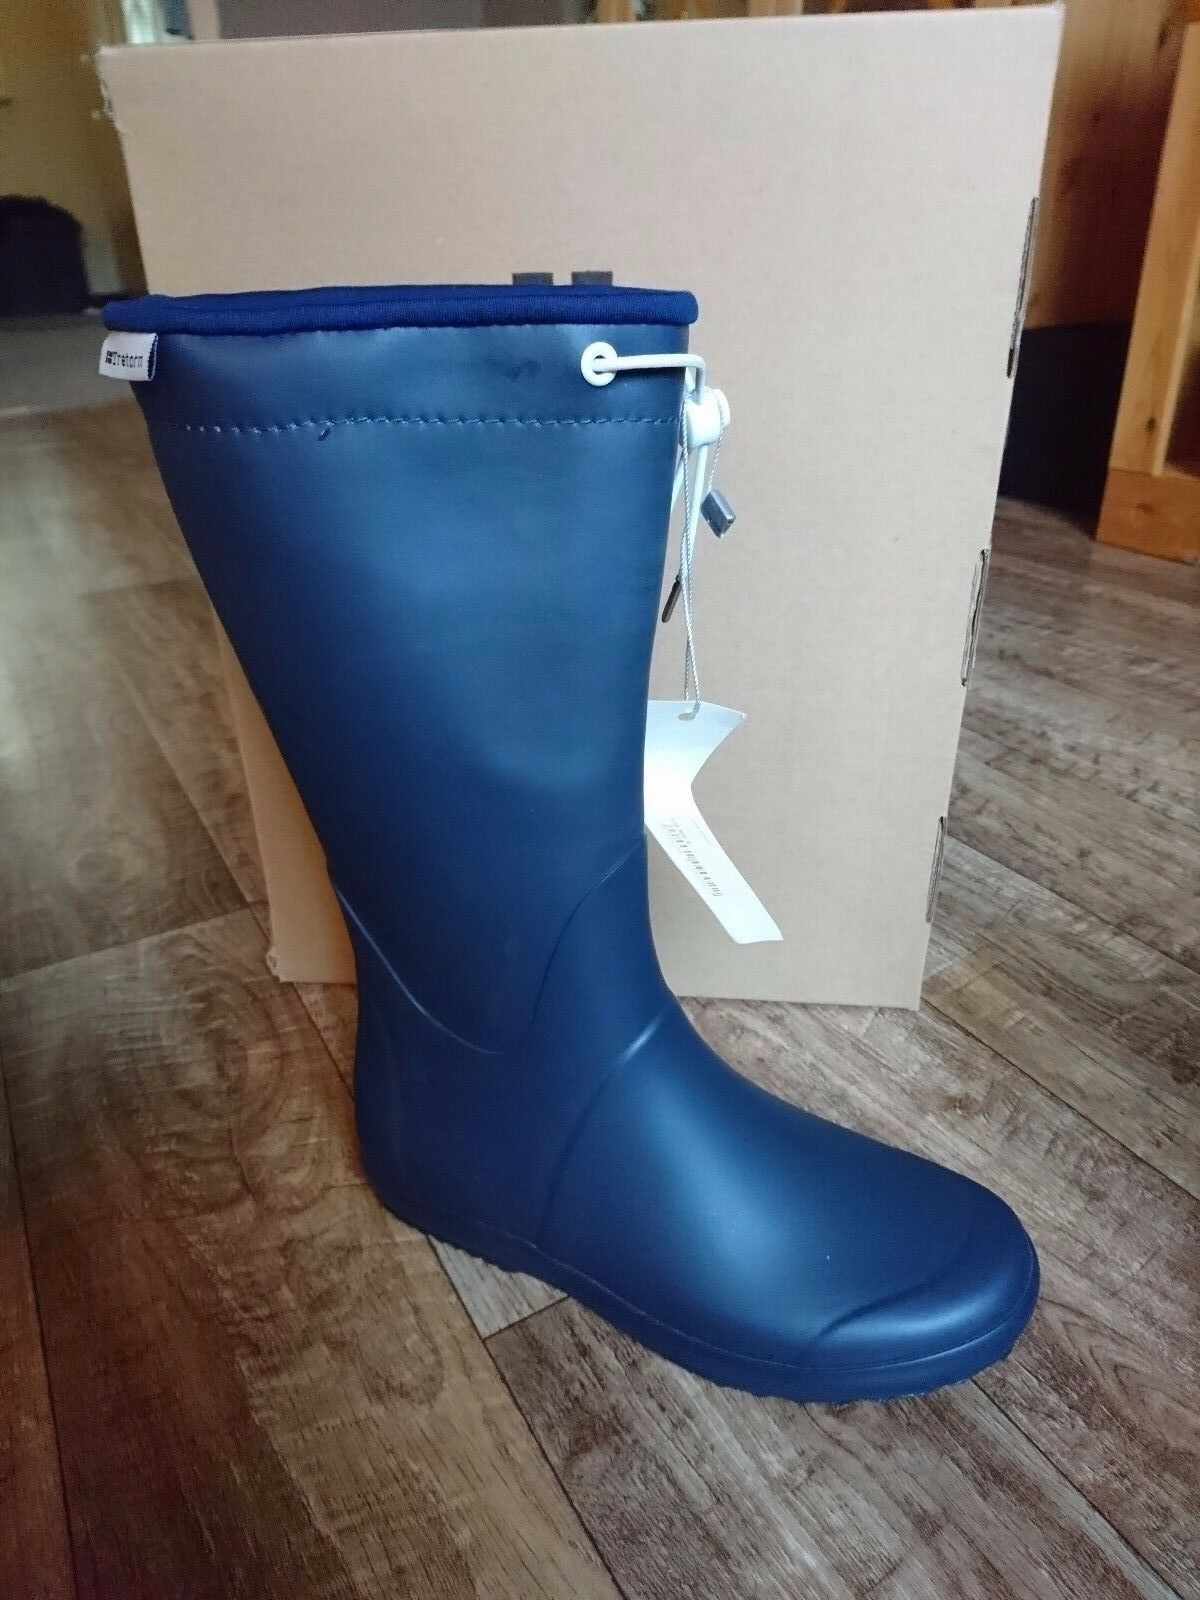 Tretorn Viken W señora botas de goma azul oscuro tamaño 36 nuevo